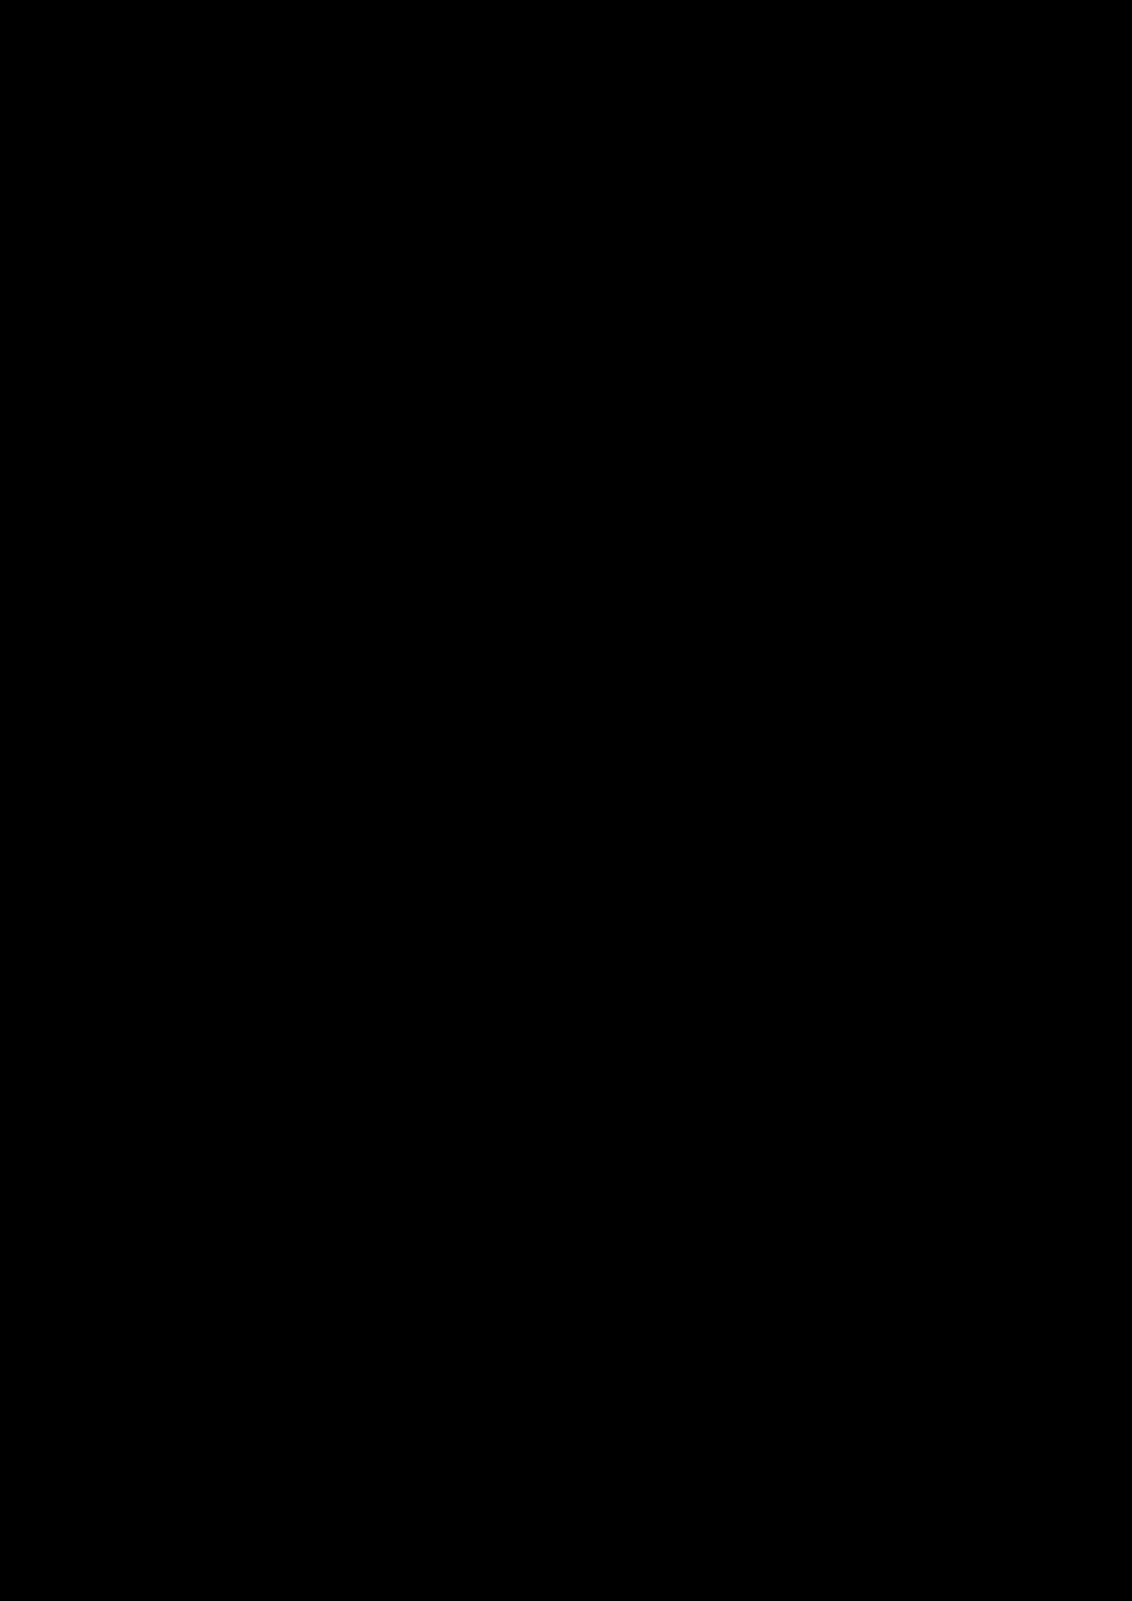 Ten lyubvi slide, Image 5